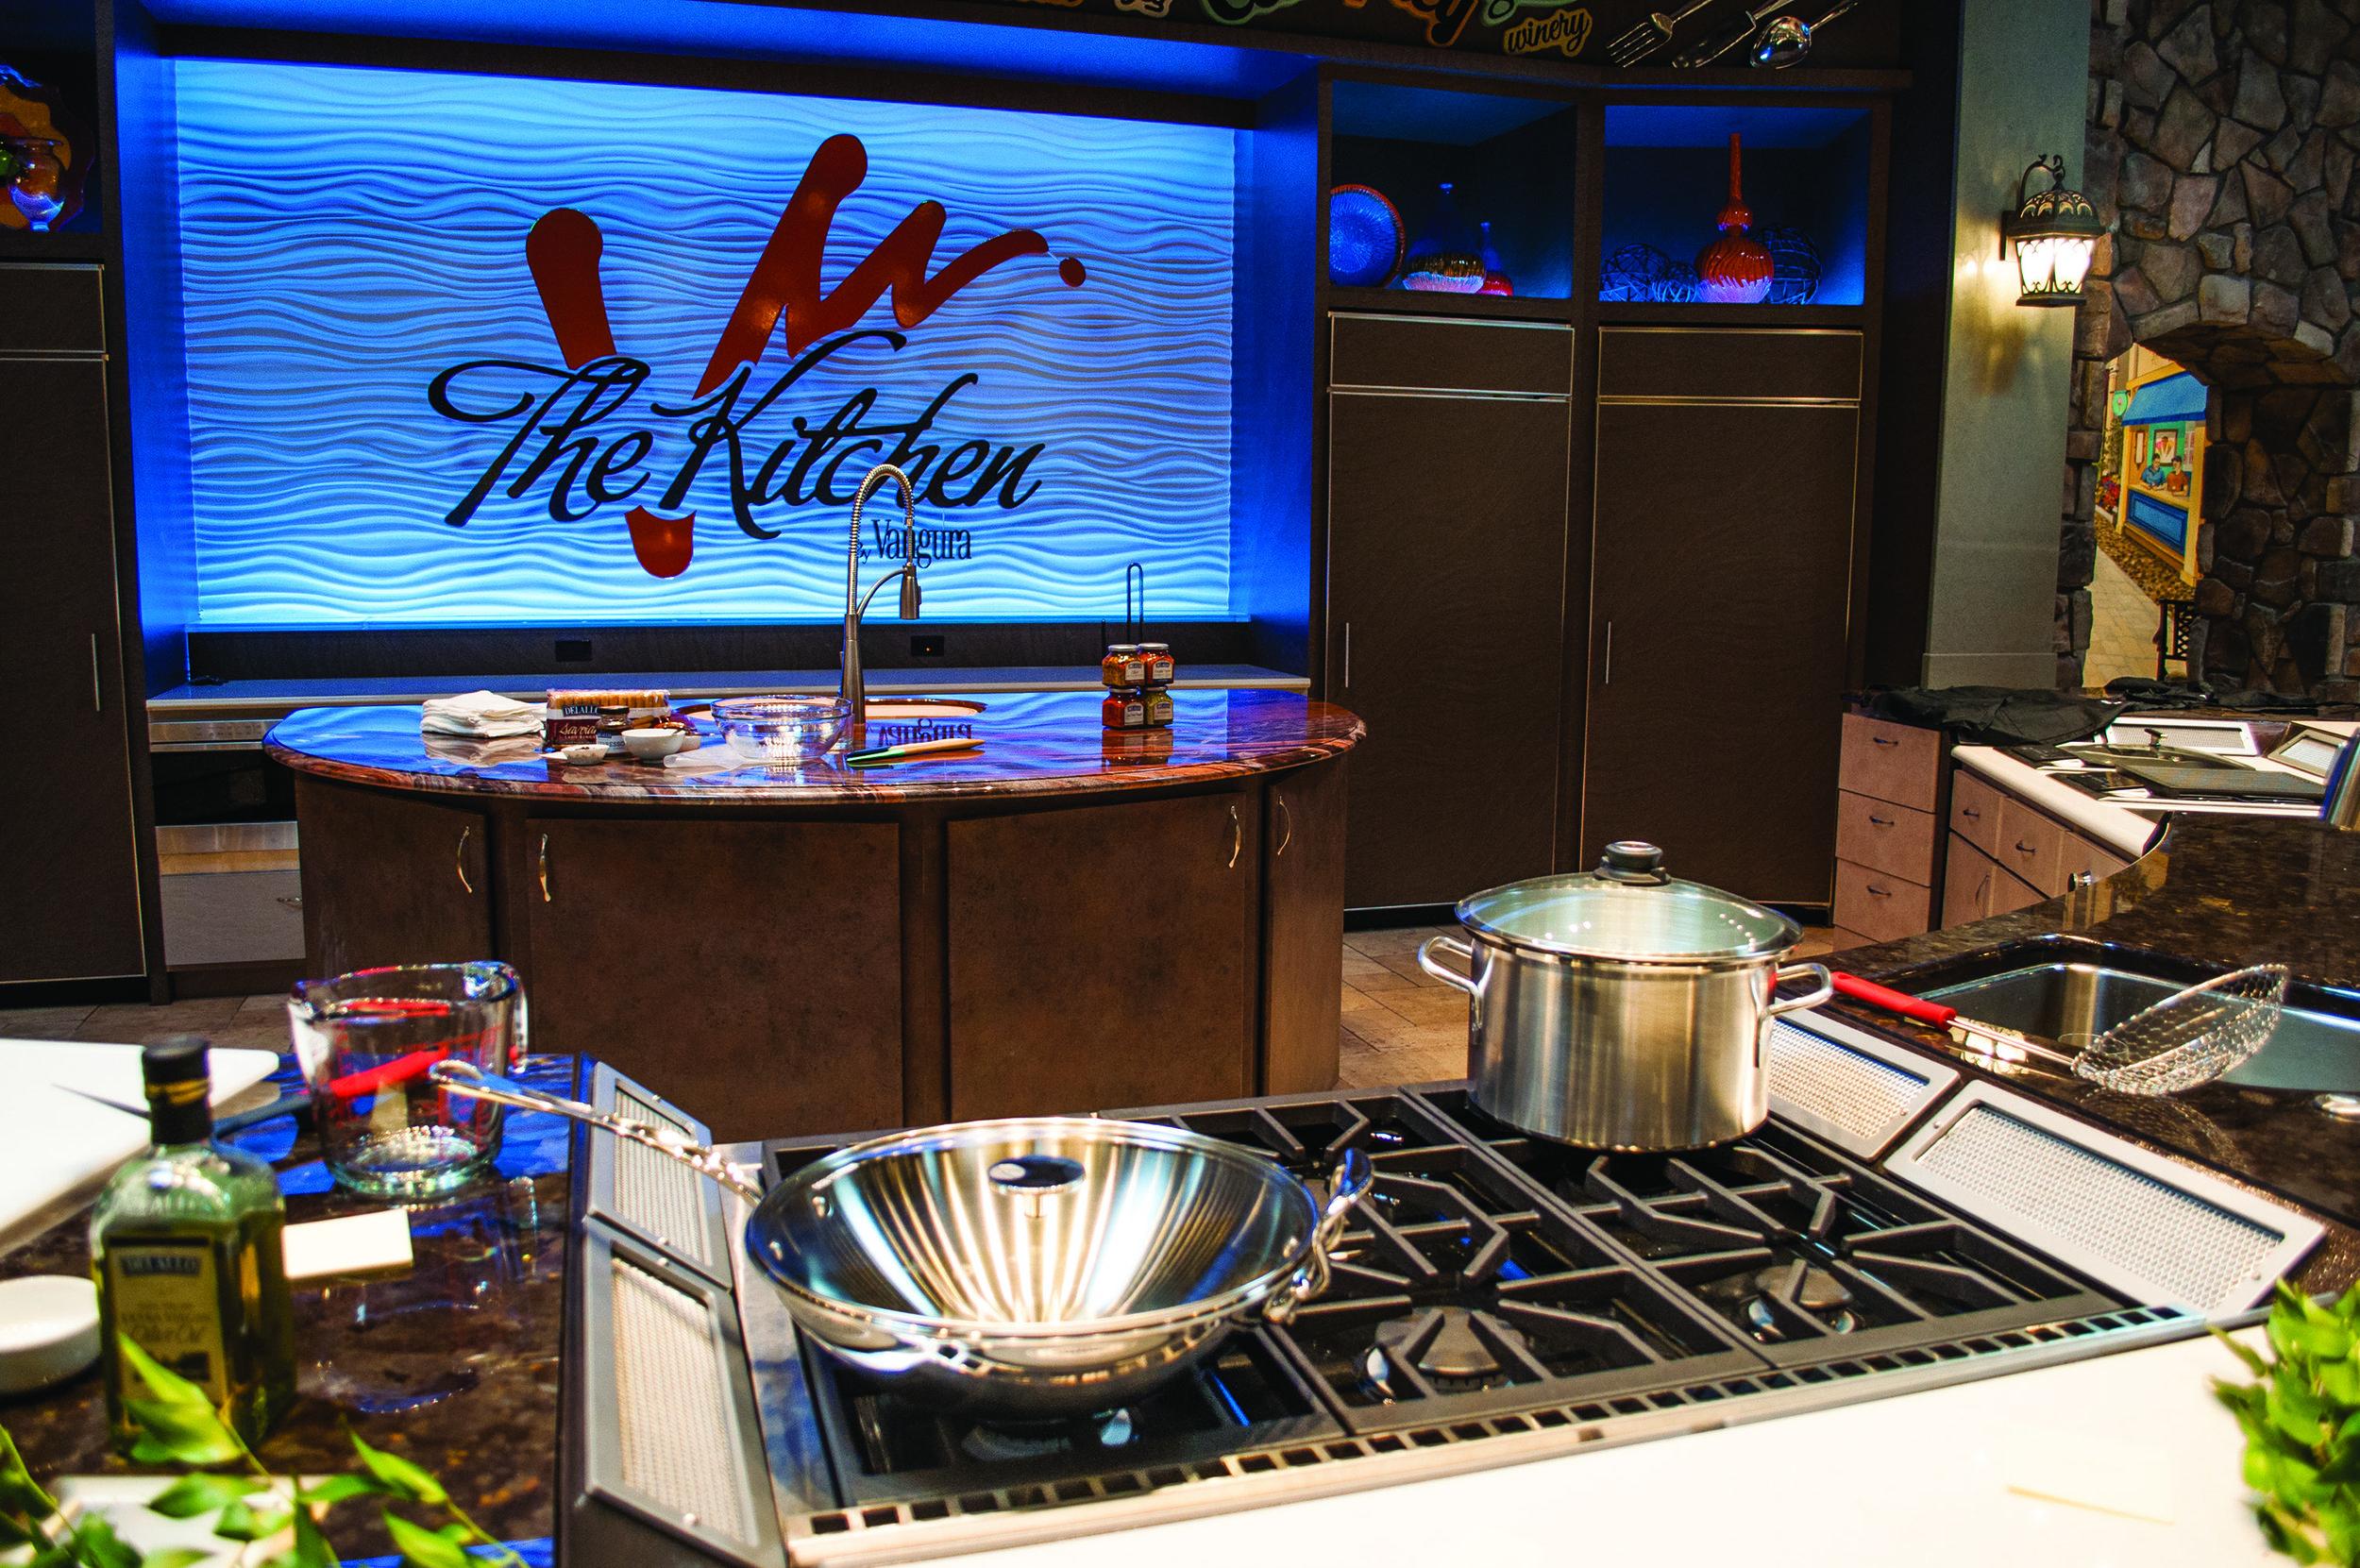 The Kitchen by Vangura